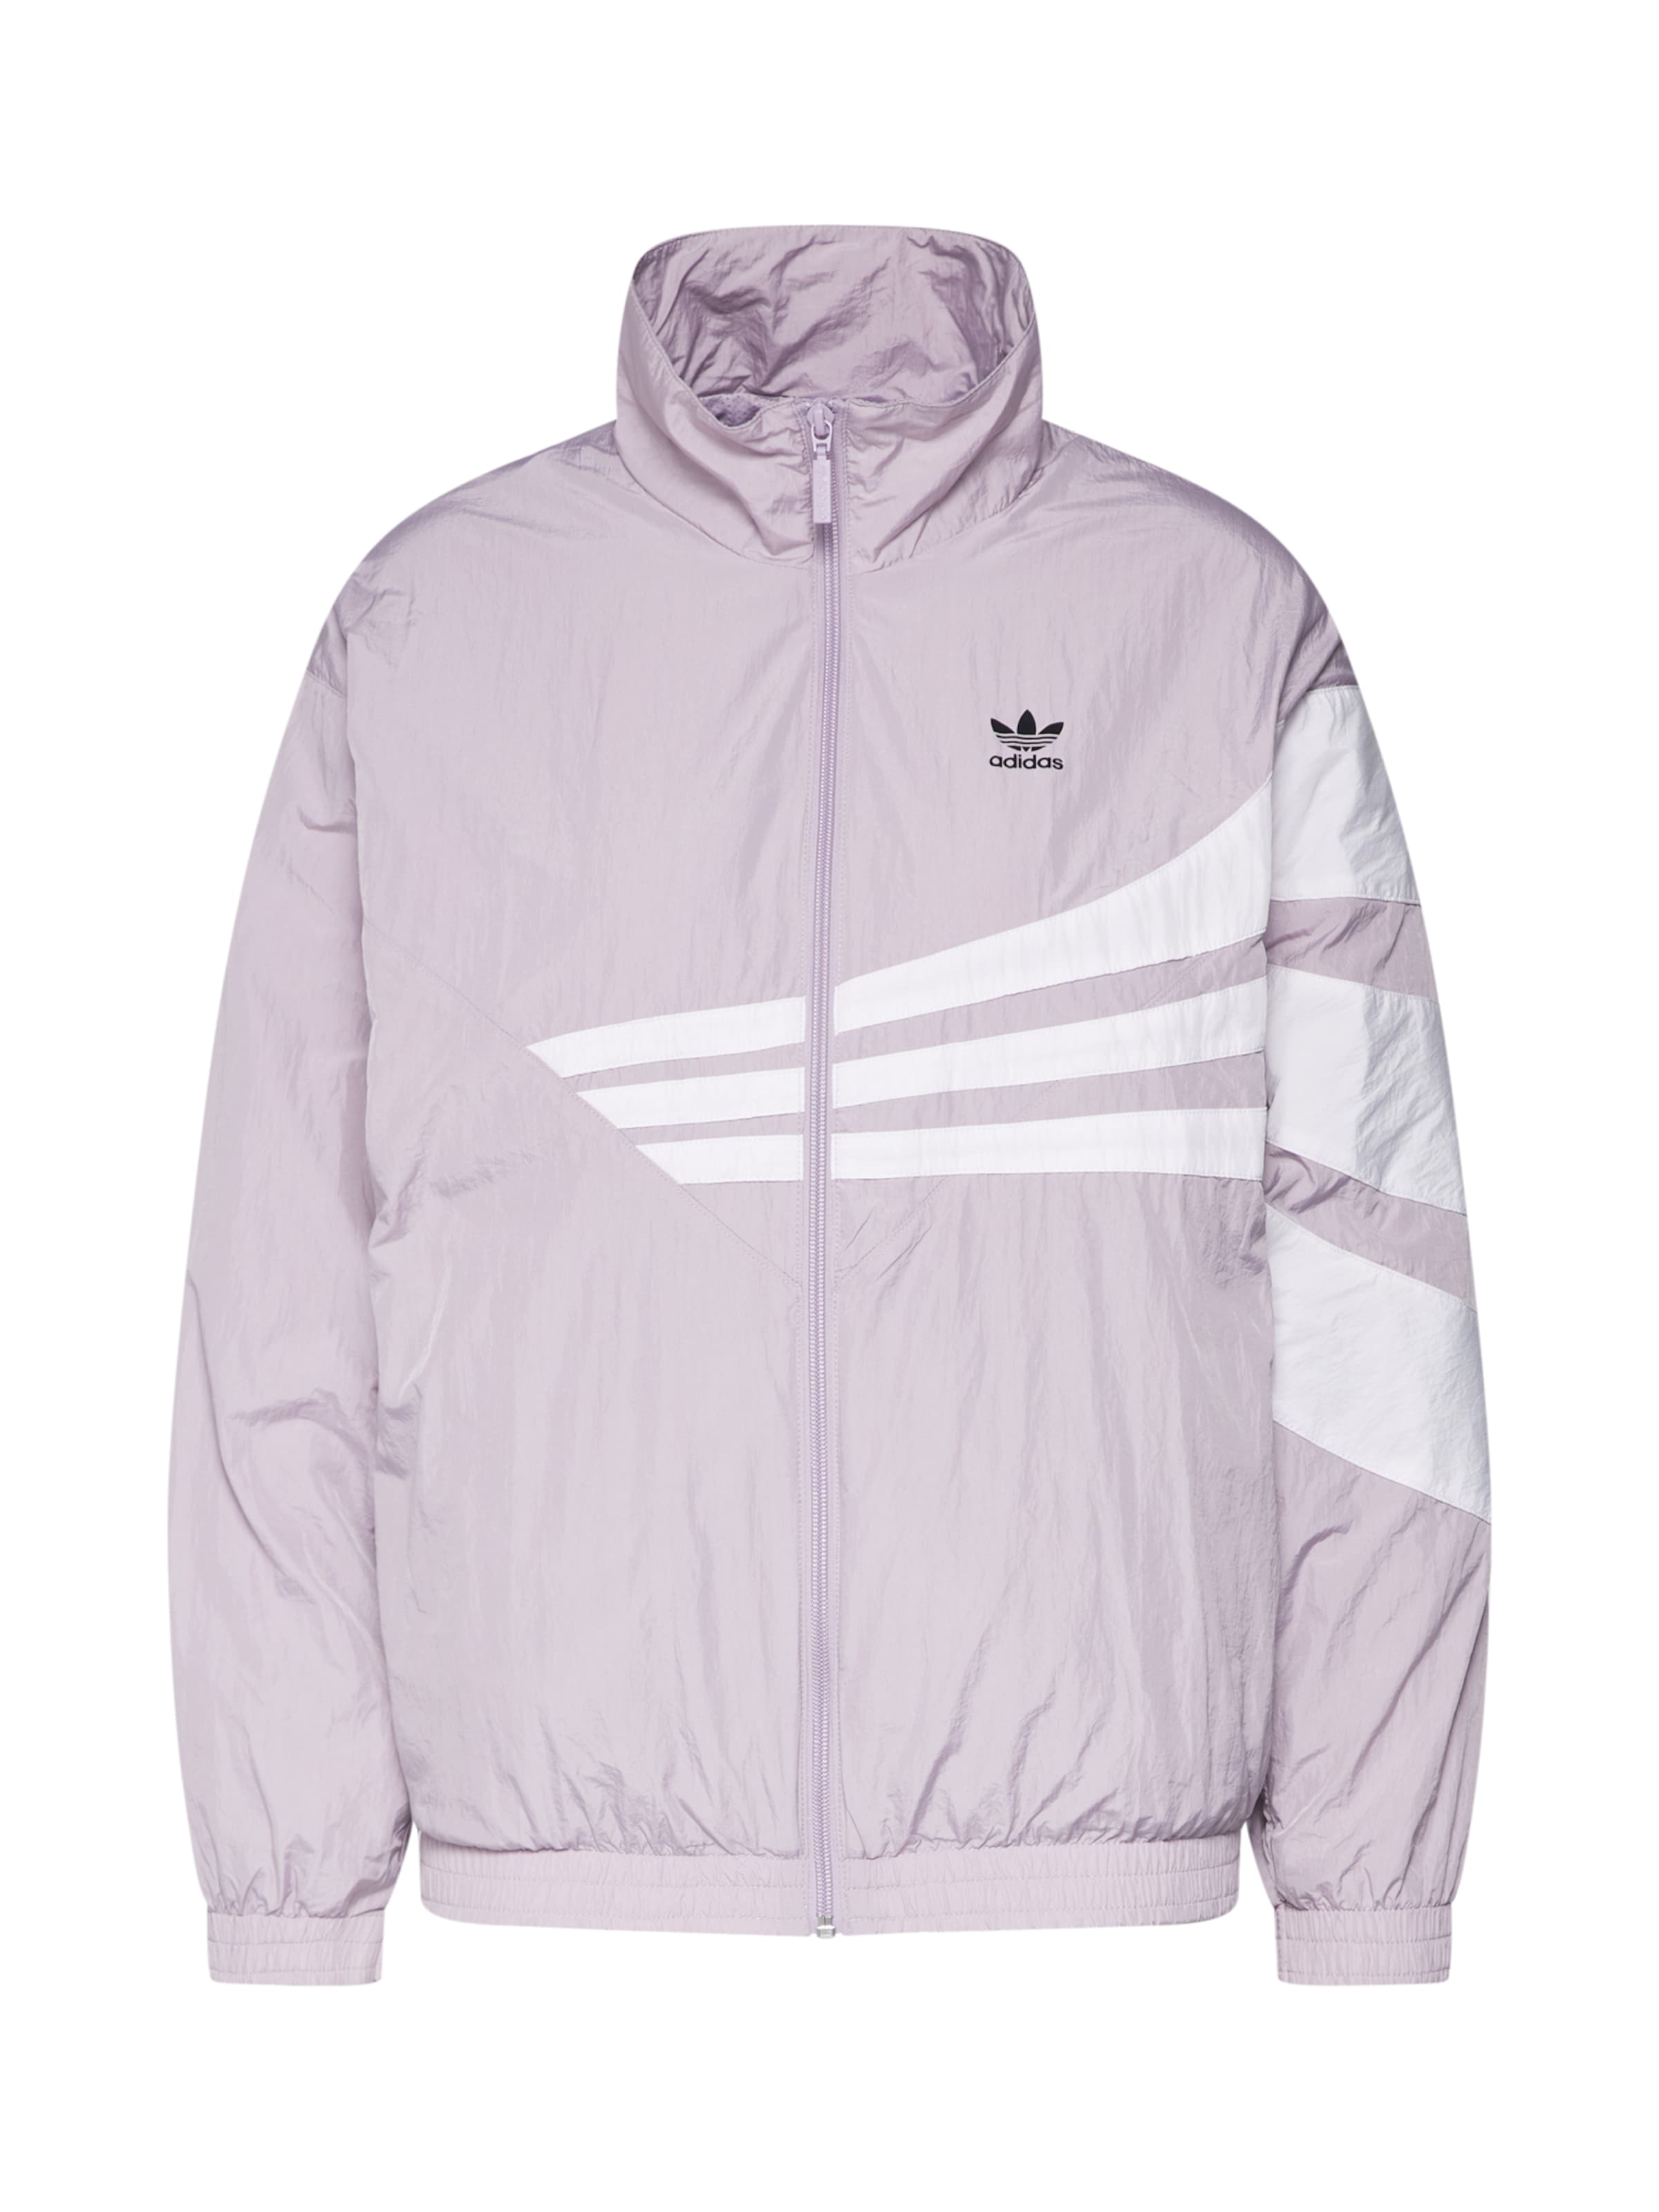 Violet saison Adidas Mi OriginalsVeste In PastelBlanc YyvIgb7f6